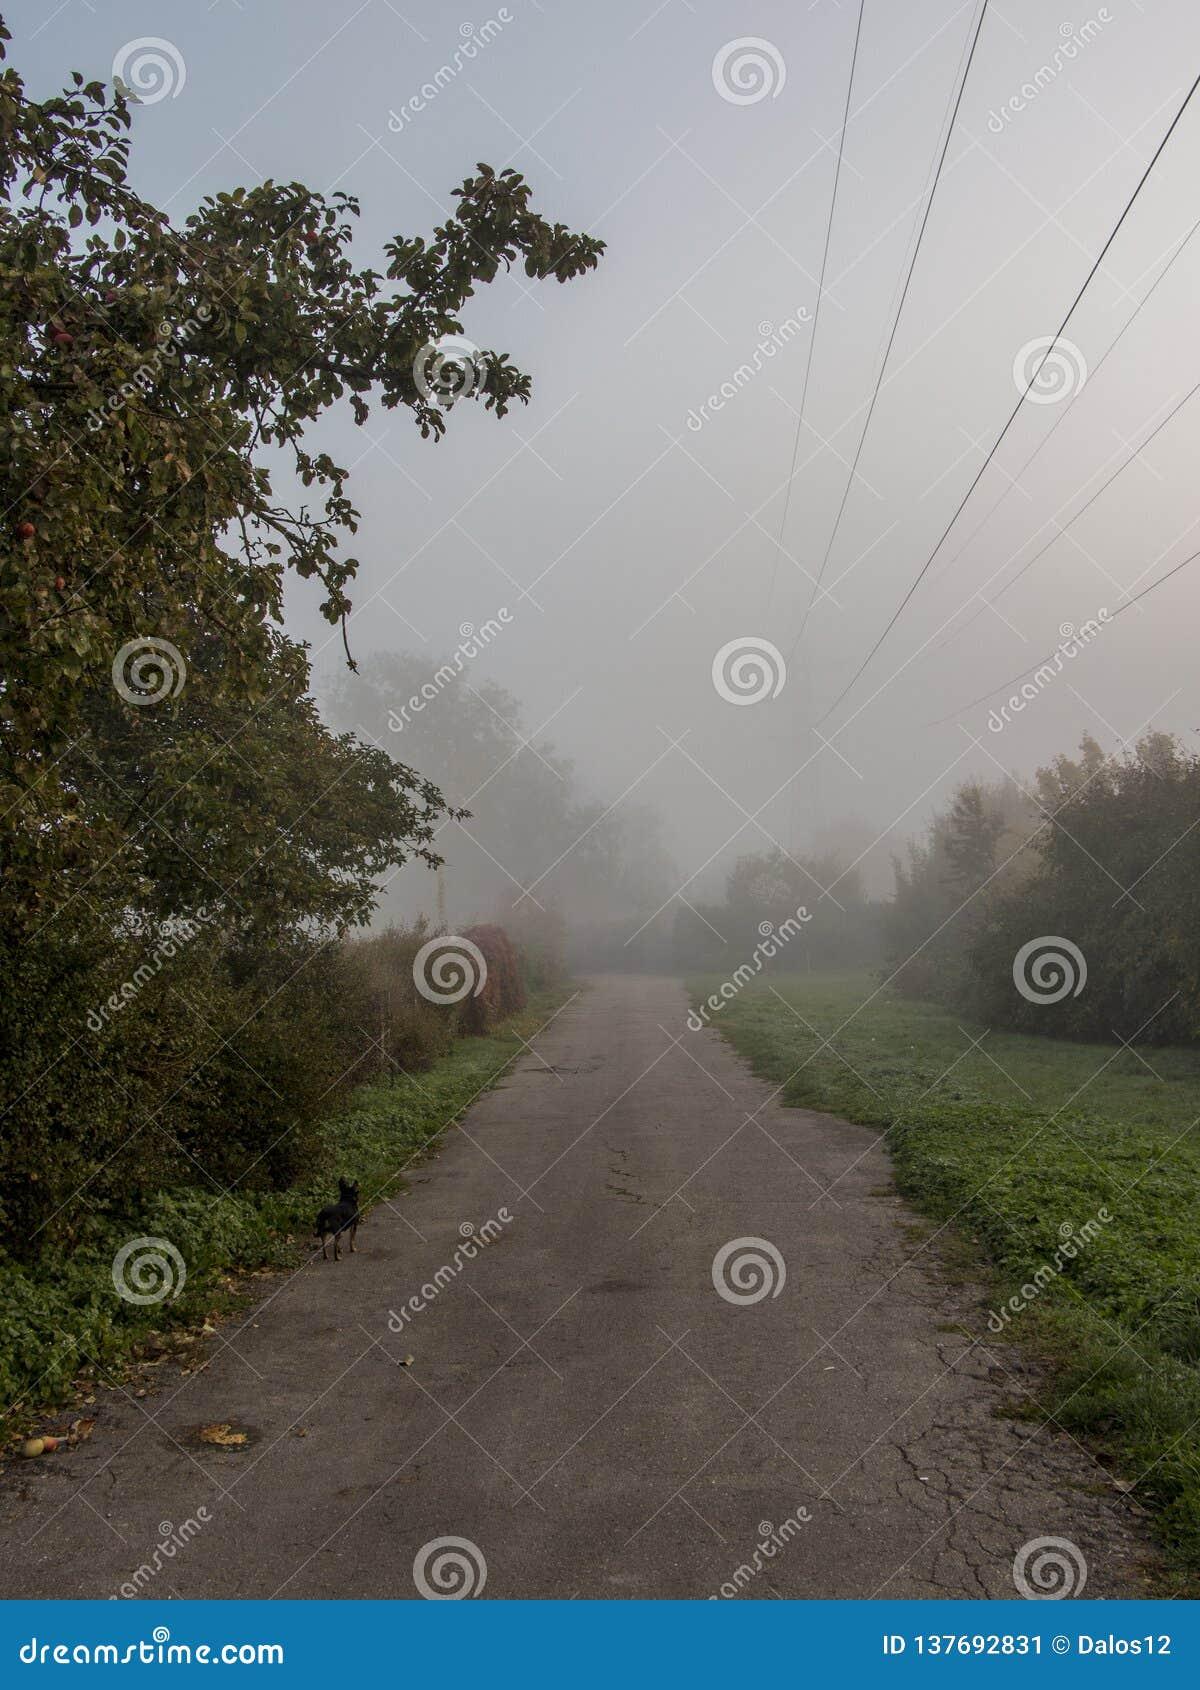 The misty road. Road Danger - fog.